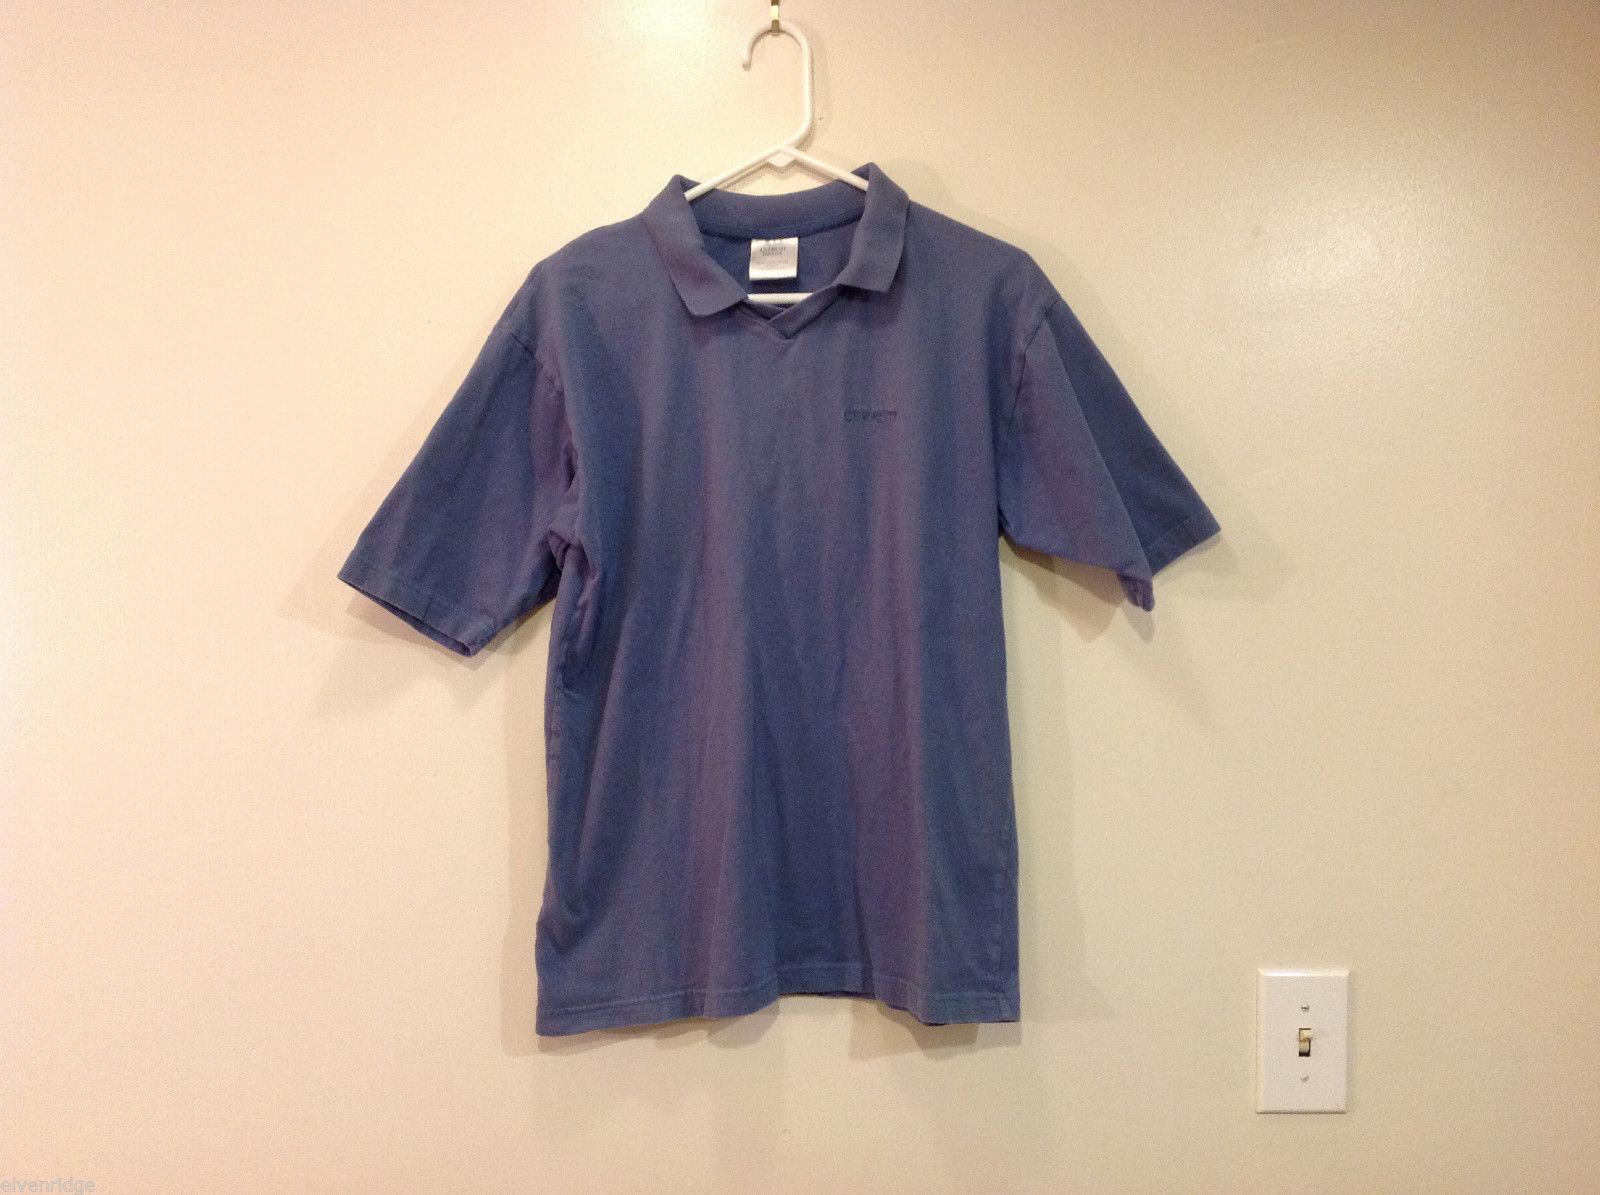 Cerruti Image Soft Blue 100% Cotton Polo T-Shirt, One Size (see measurements)